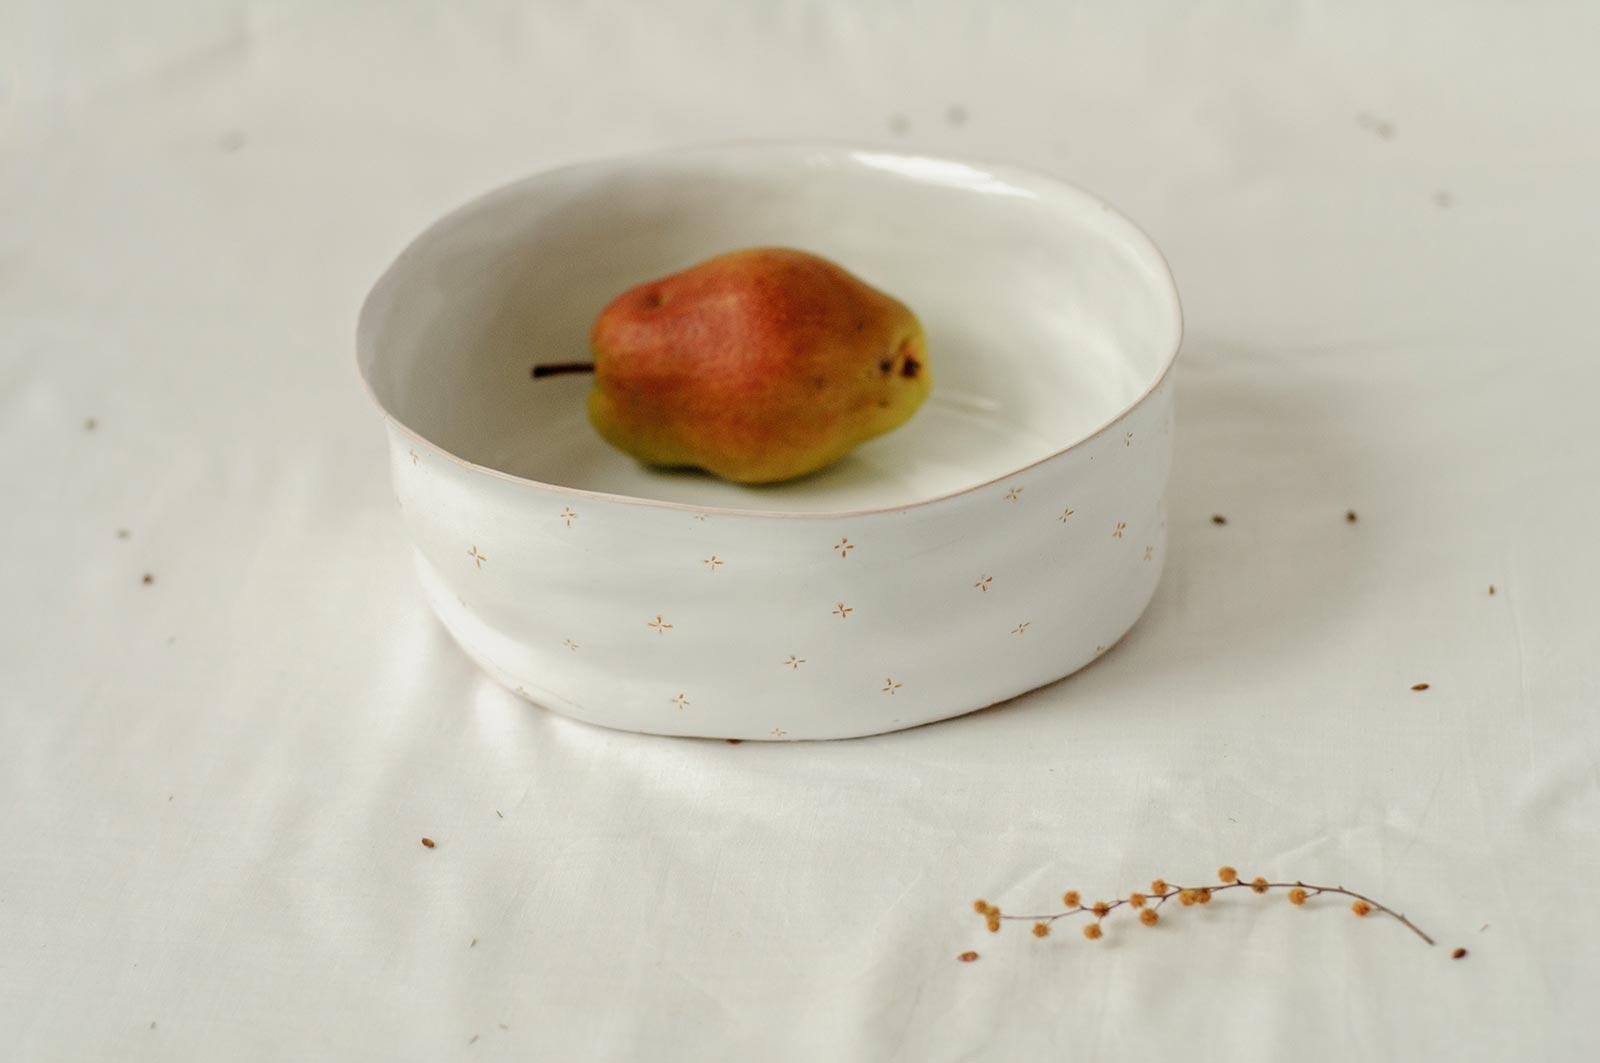 Decor - Big deep plate from ceramics